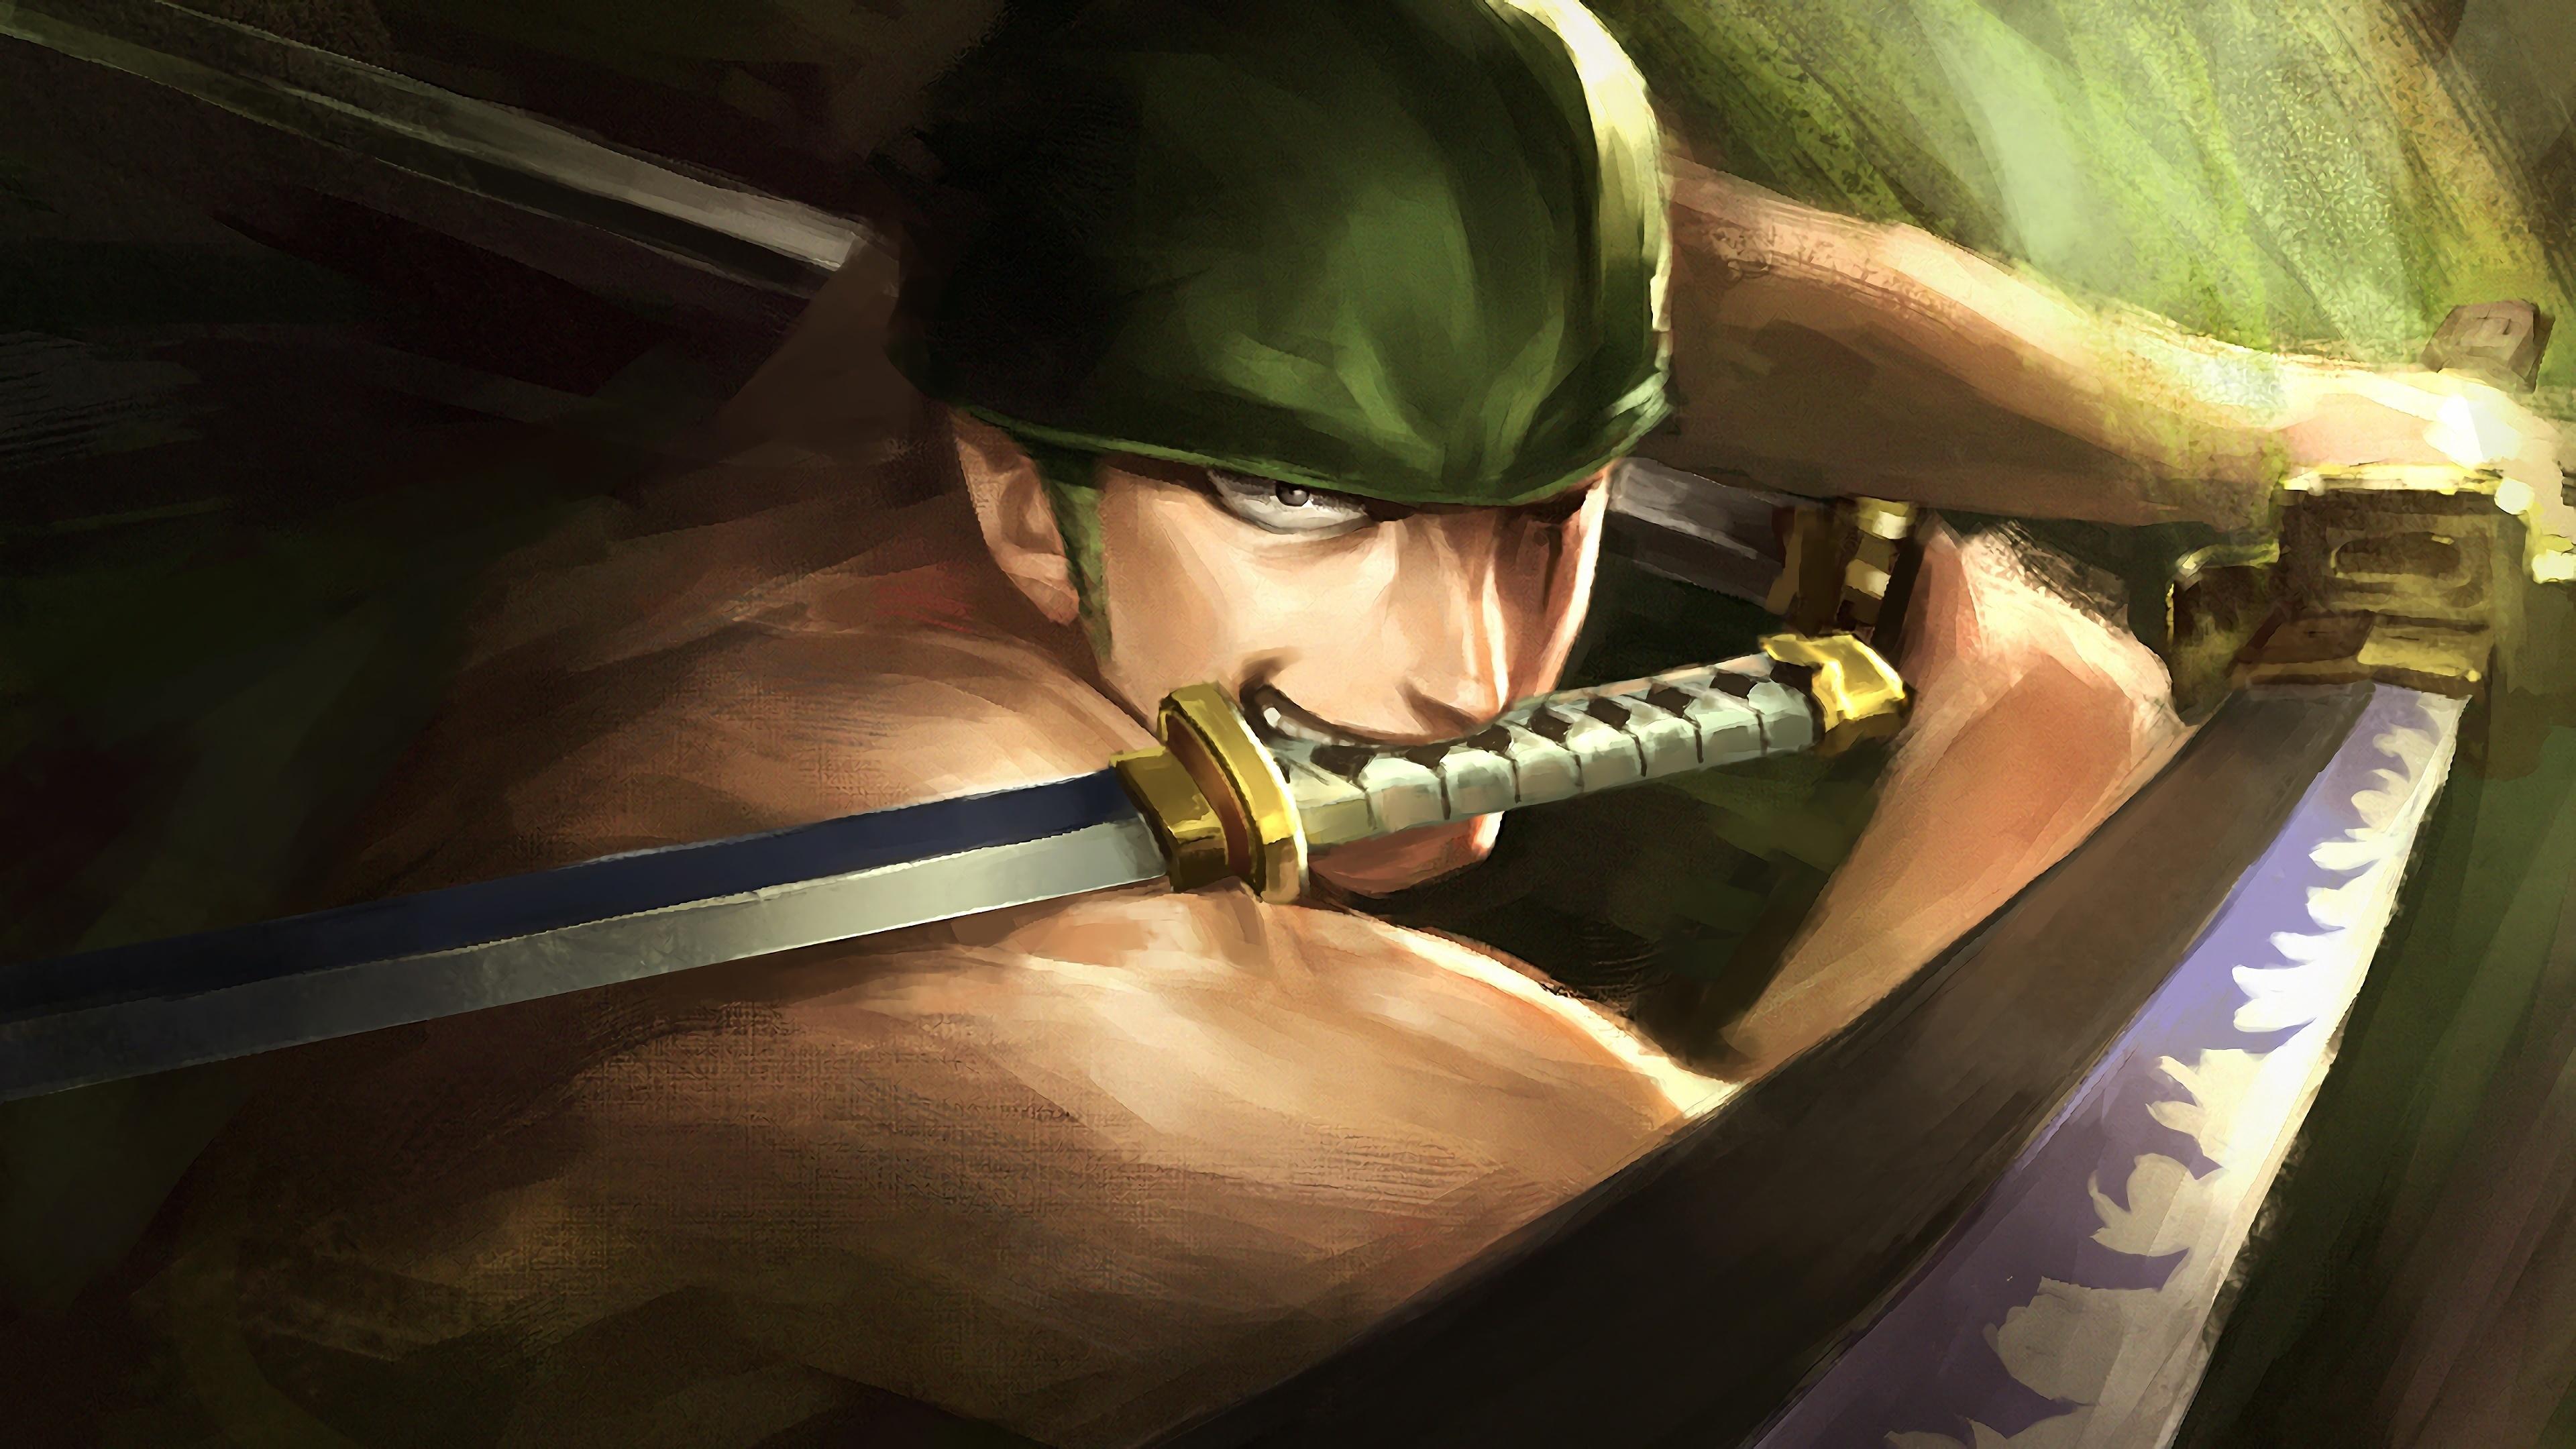 Download 3840x2160 Wallpaper Artwork Warrior Roronoa Zoro